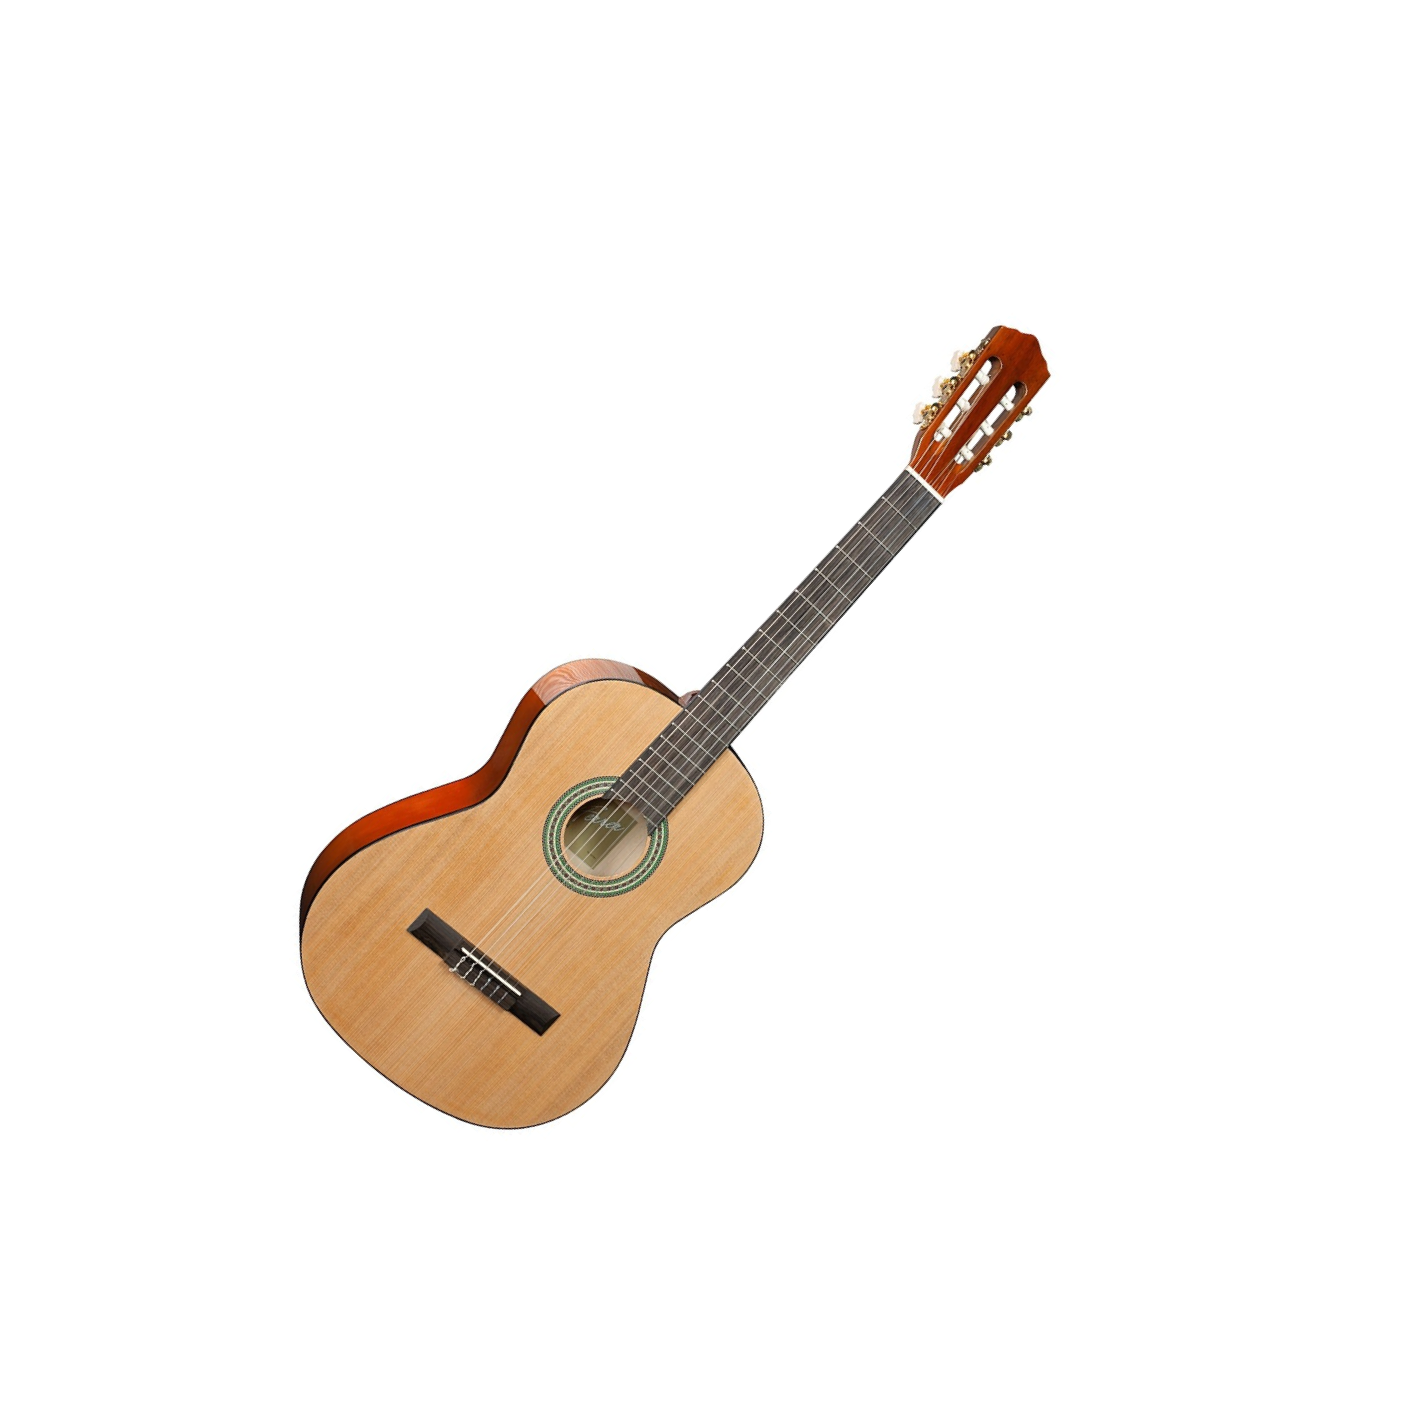 Jose Ferrer Estudiante 4/4 Classical Guitar 5209A